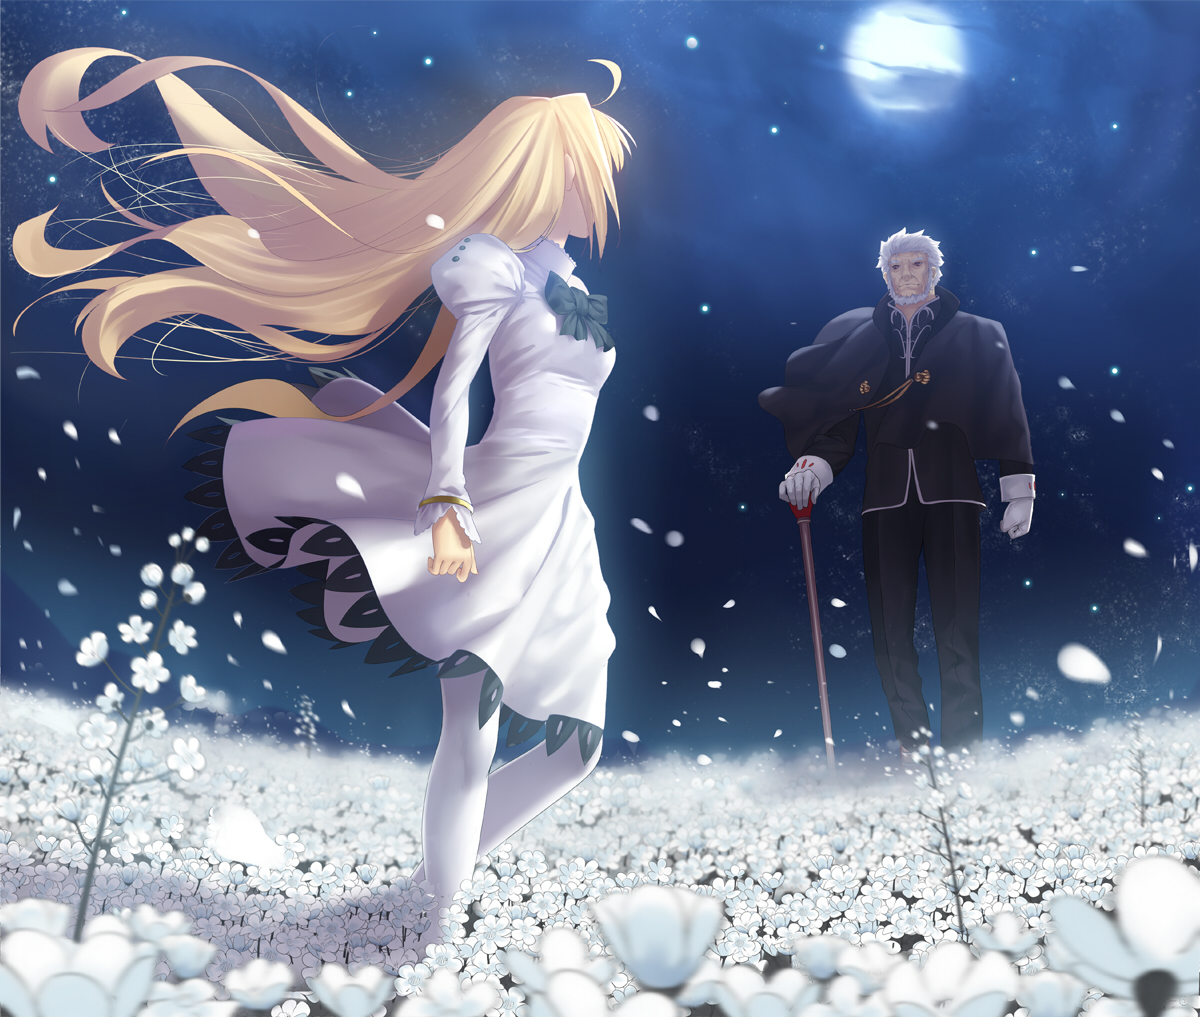 Sakura Hime: The Legend of Princess Sakura , Vol. 11 (SAKURA HIME KADEN), Tanemu